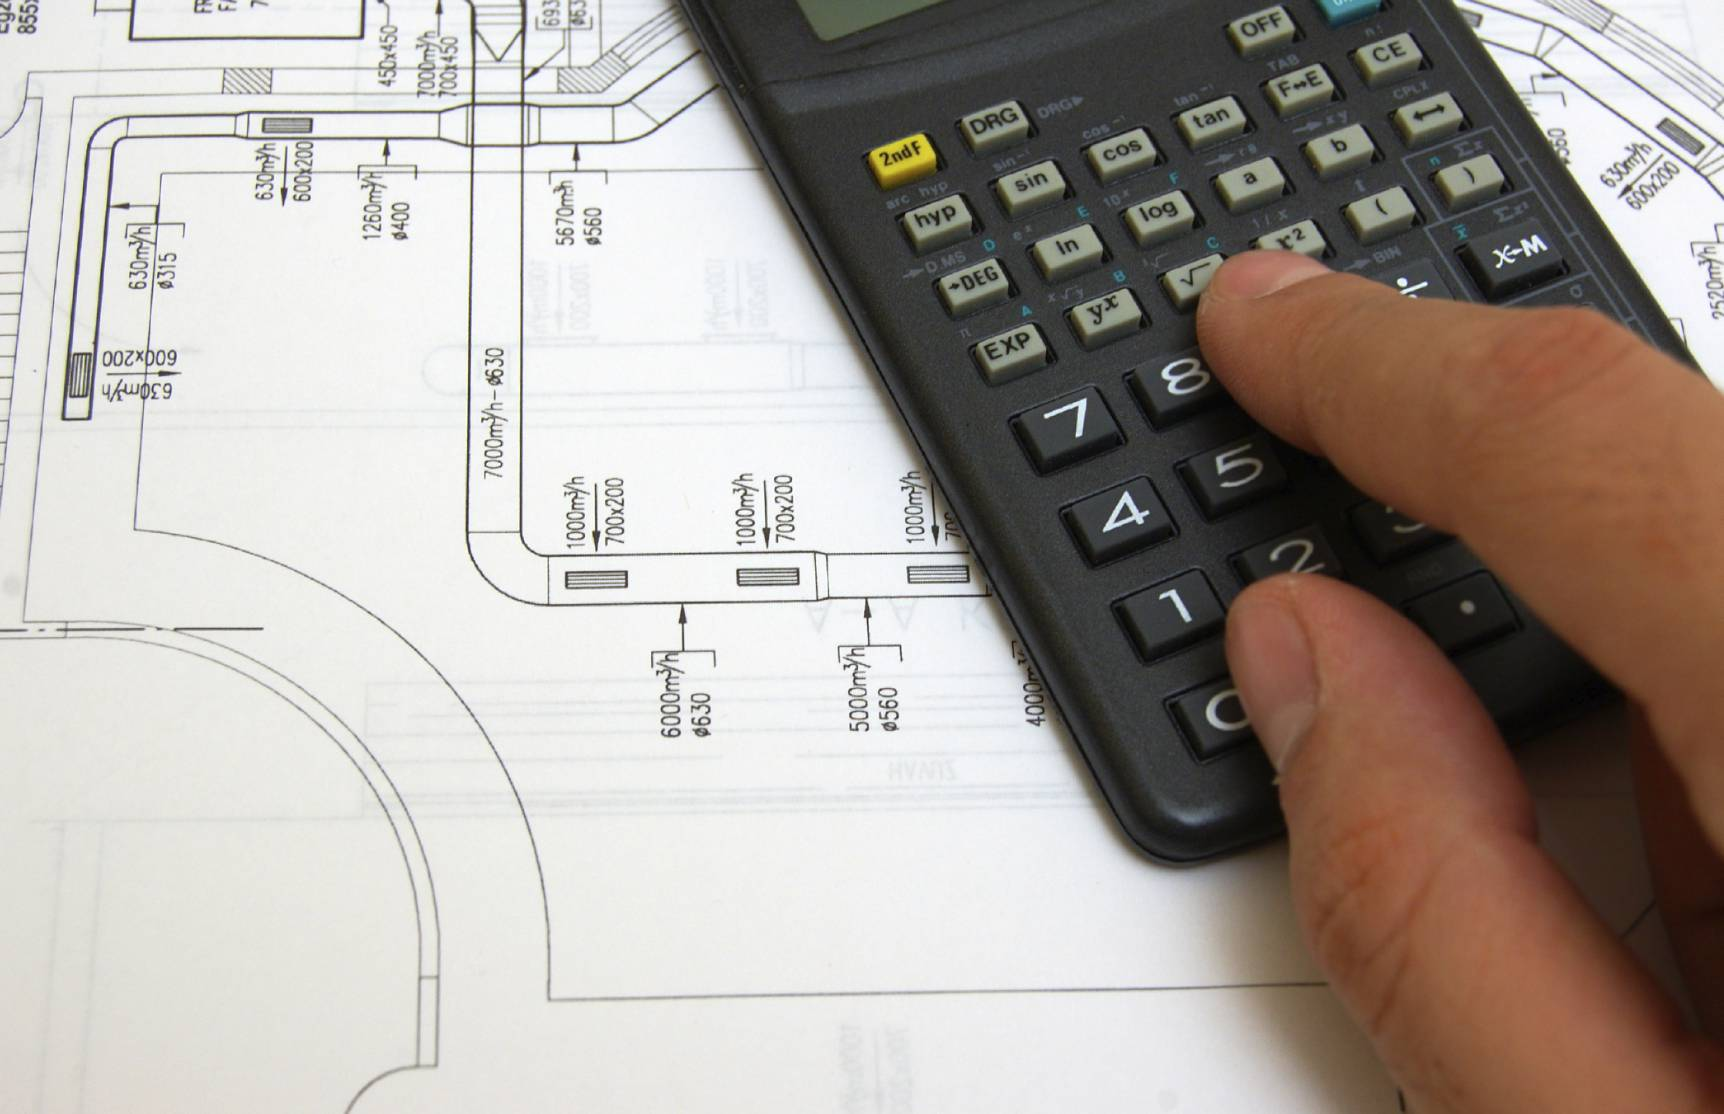 Vente immobiliere : les renseignements essentiels